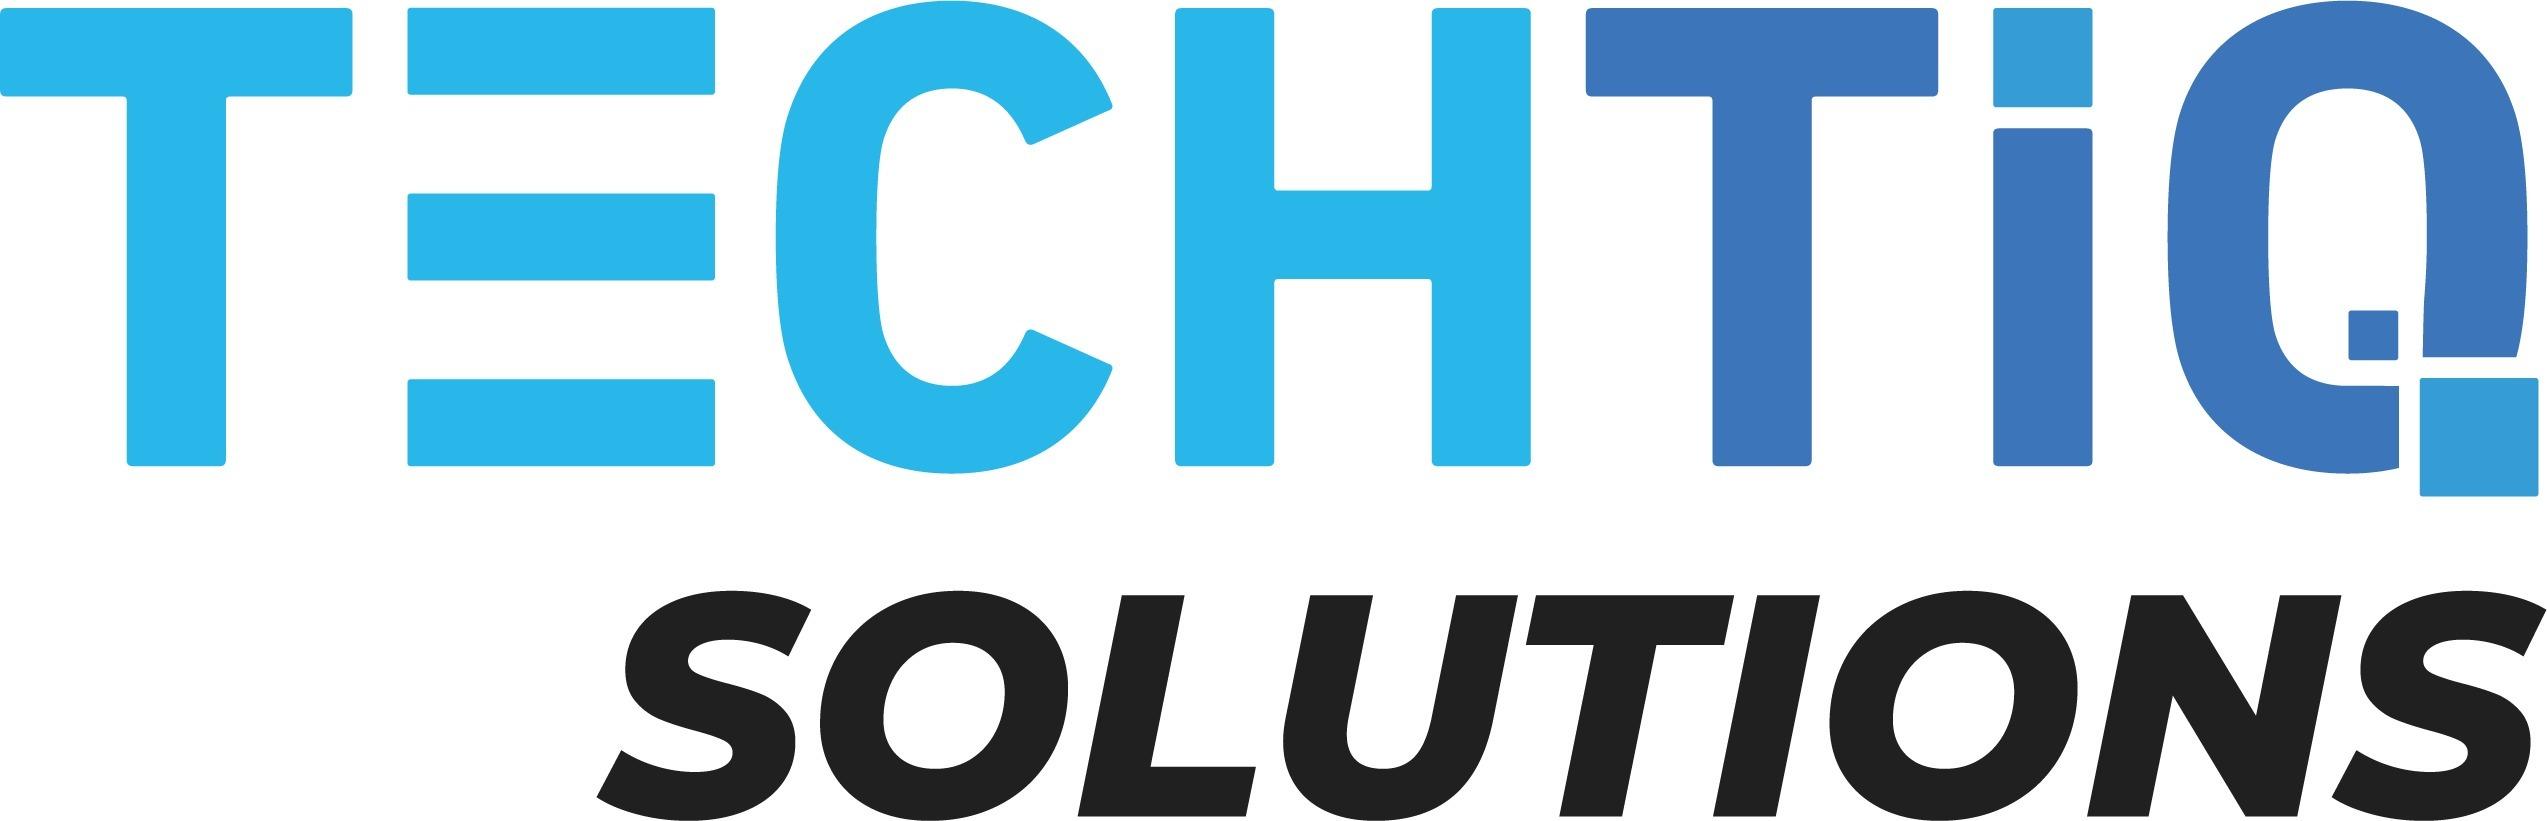 Techtiq Solutions Pte (@techtiq) Cover Image